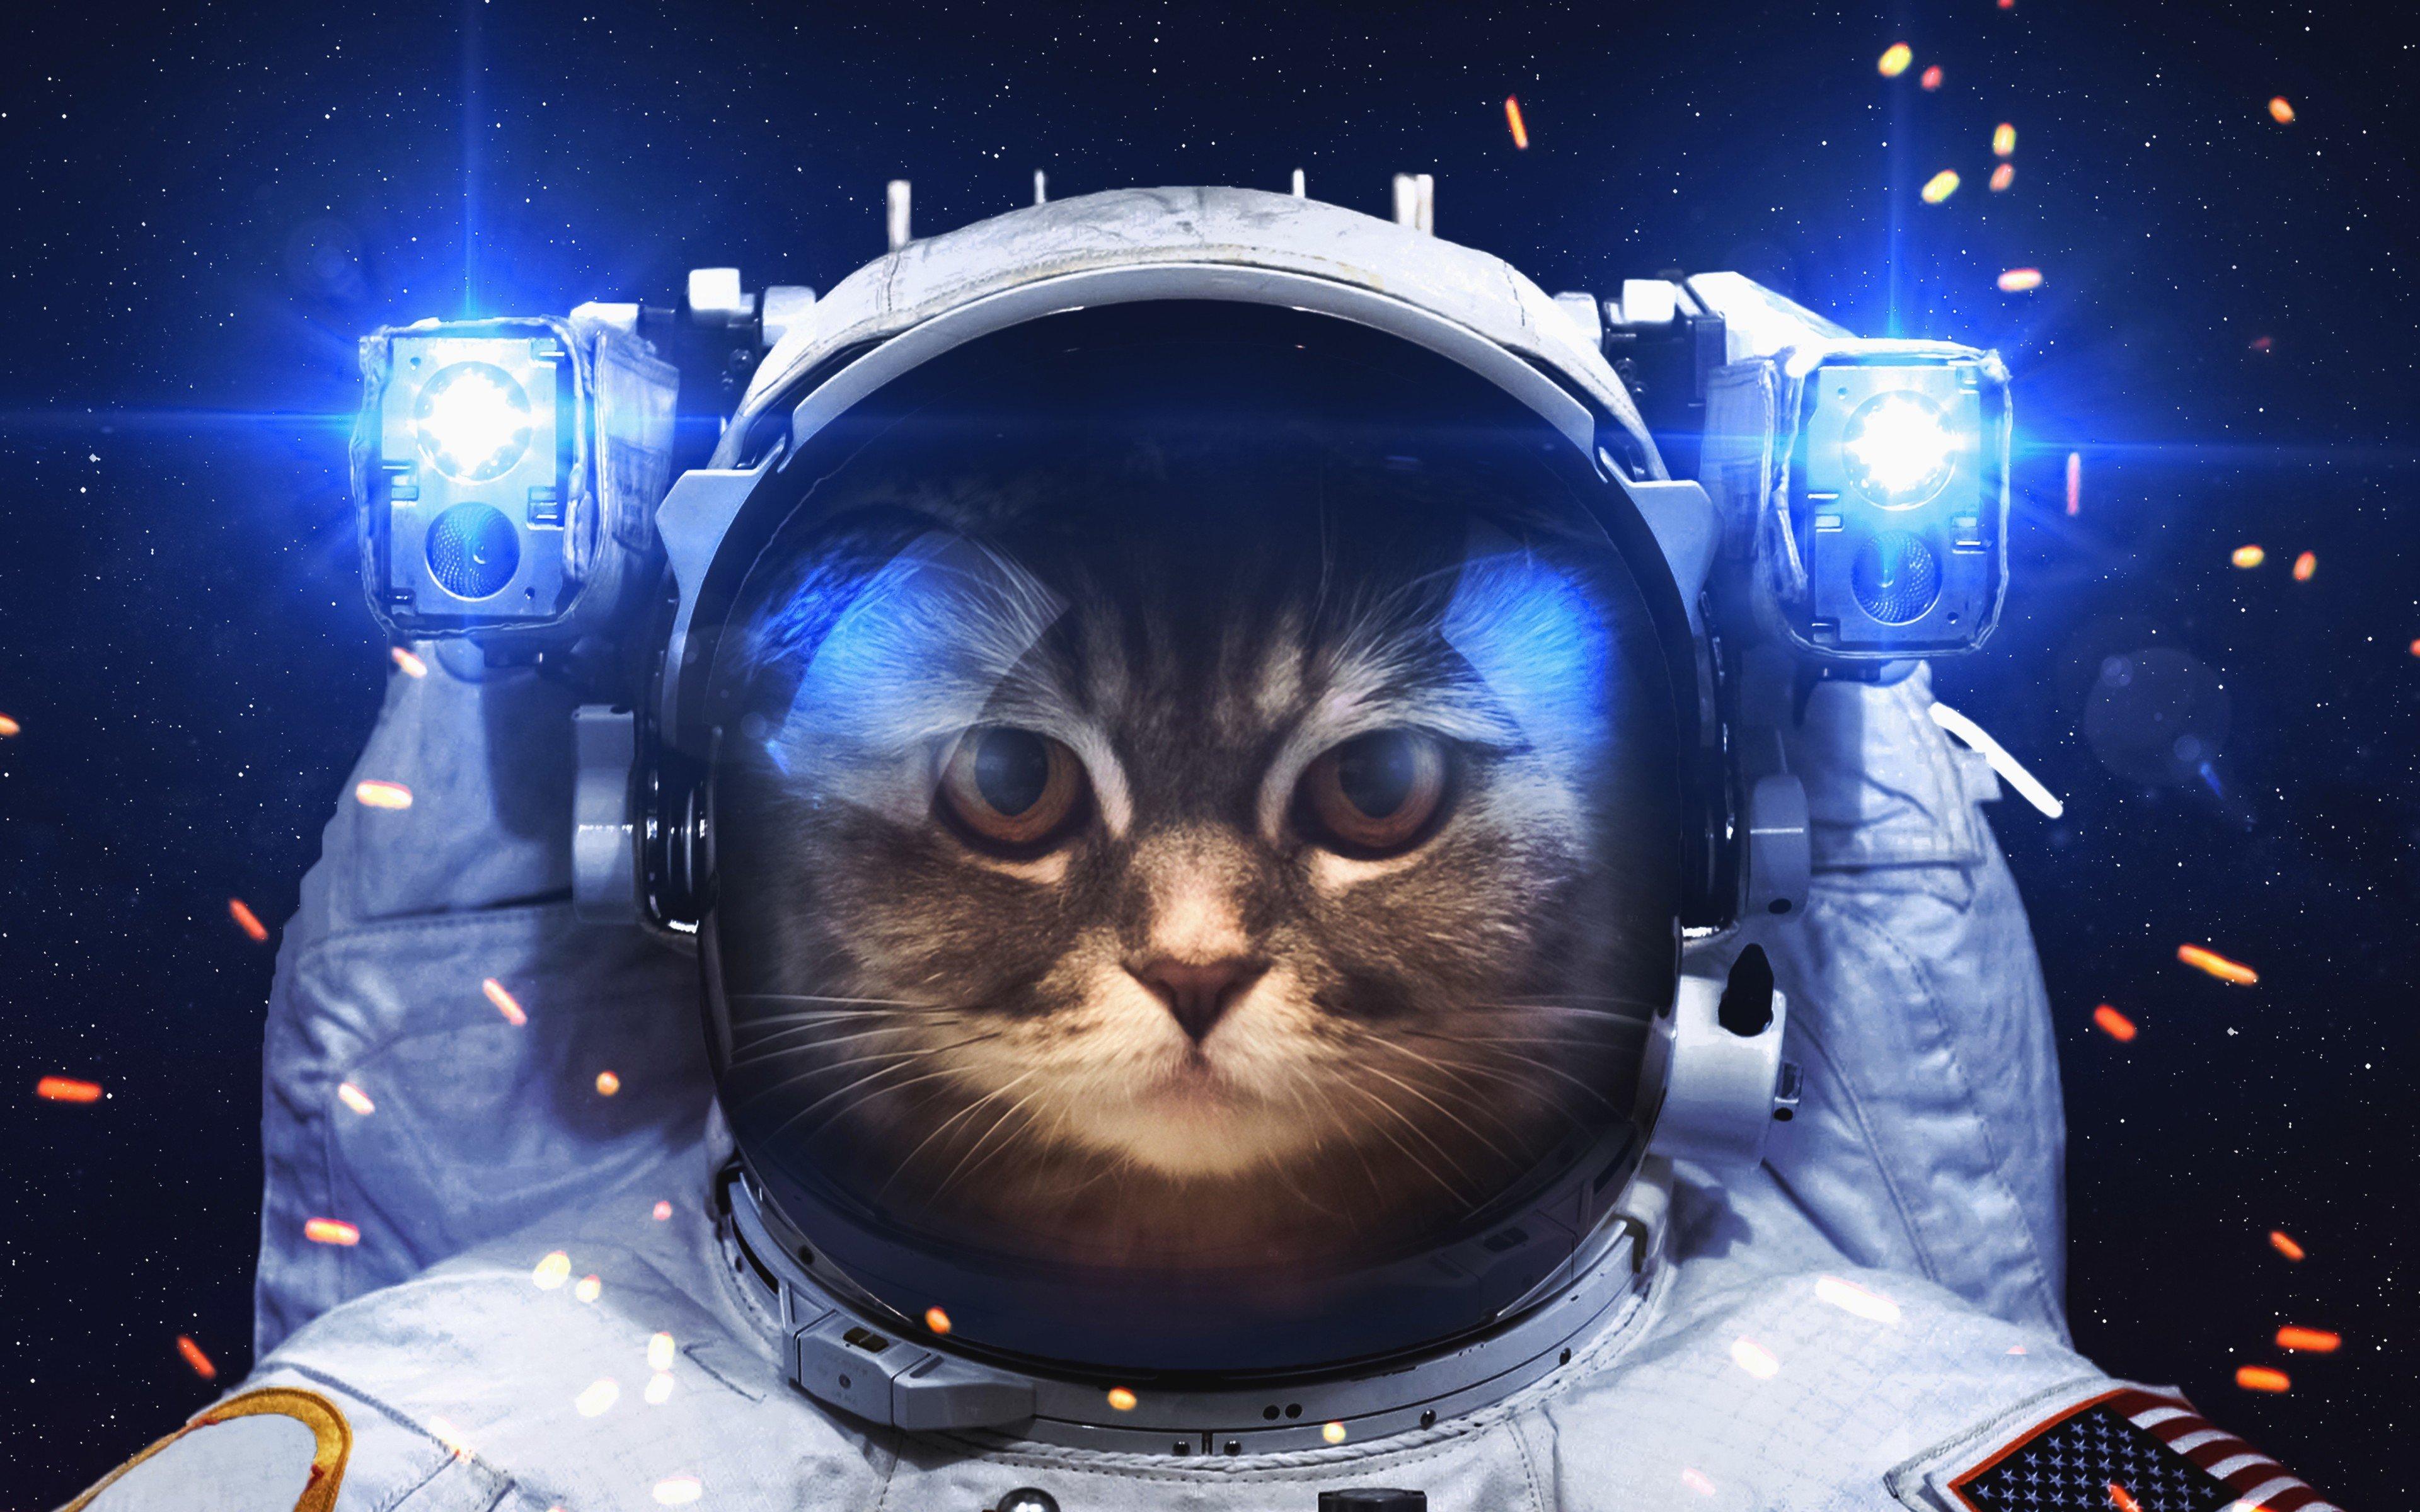 Wallpaper Astronaut Cat